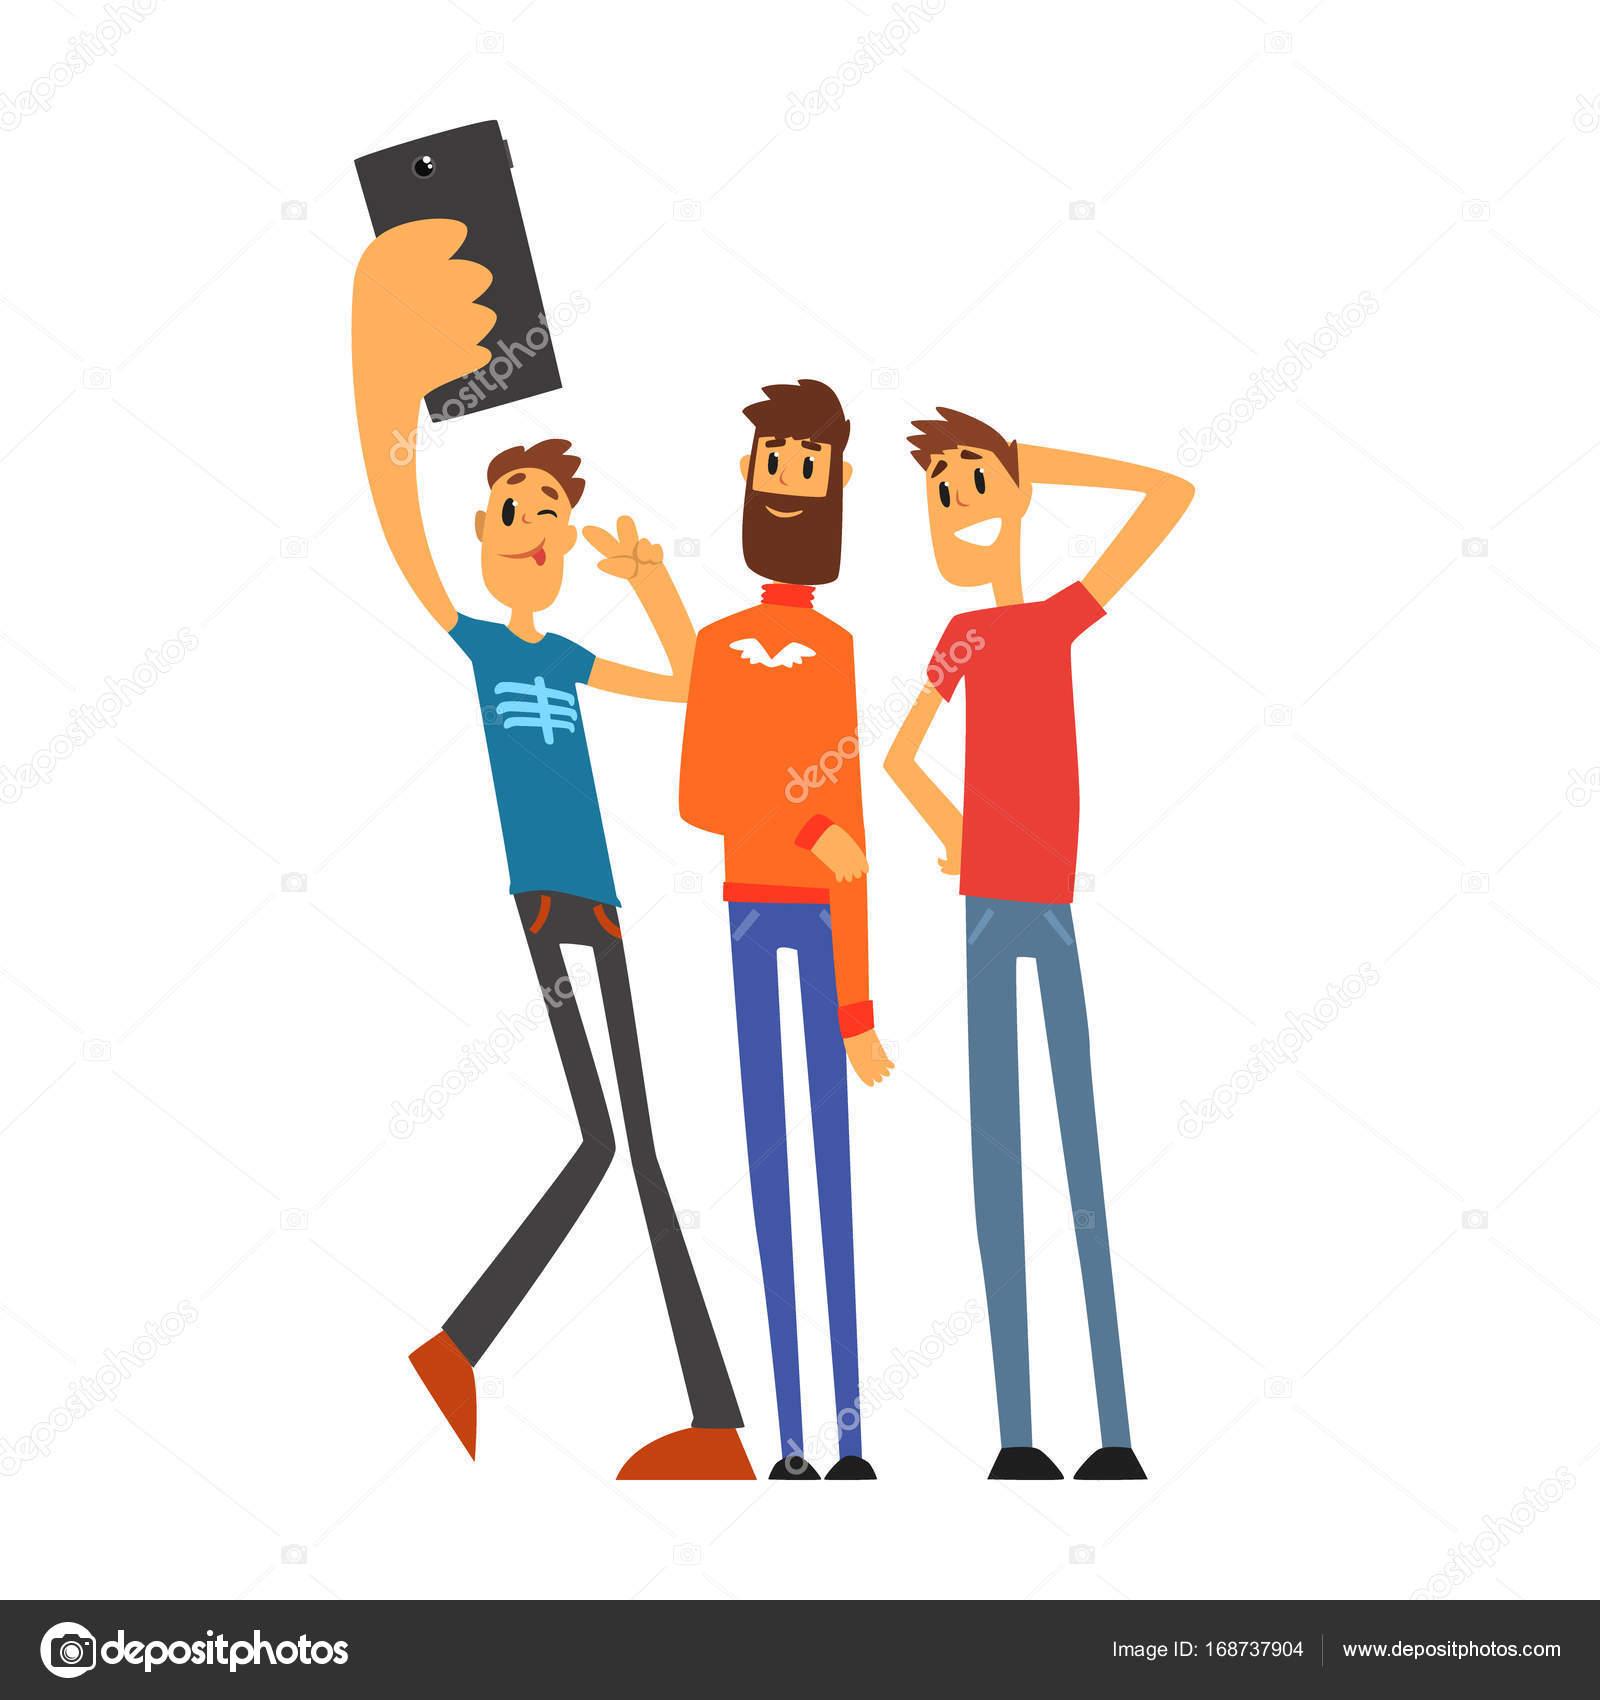 Dibujos Grupo De Amigos Grupo De Amigos Tomando Selfie Vector De